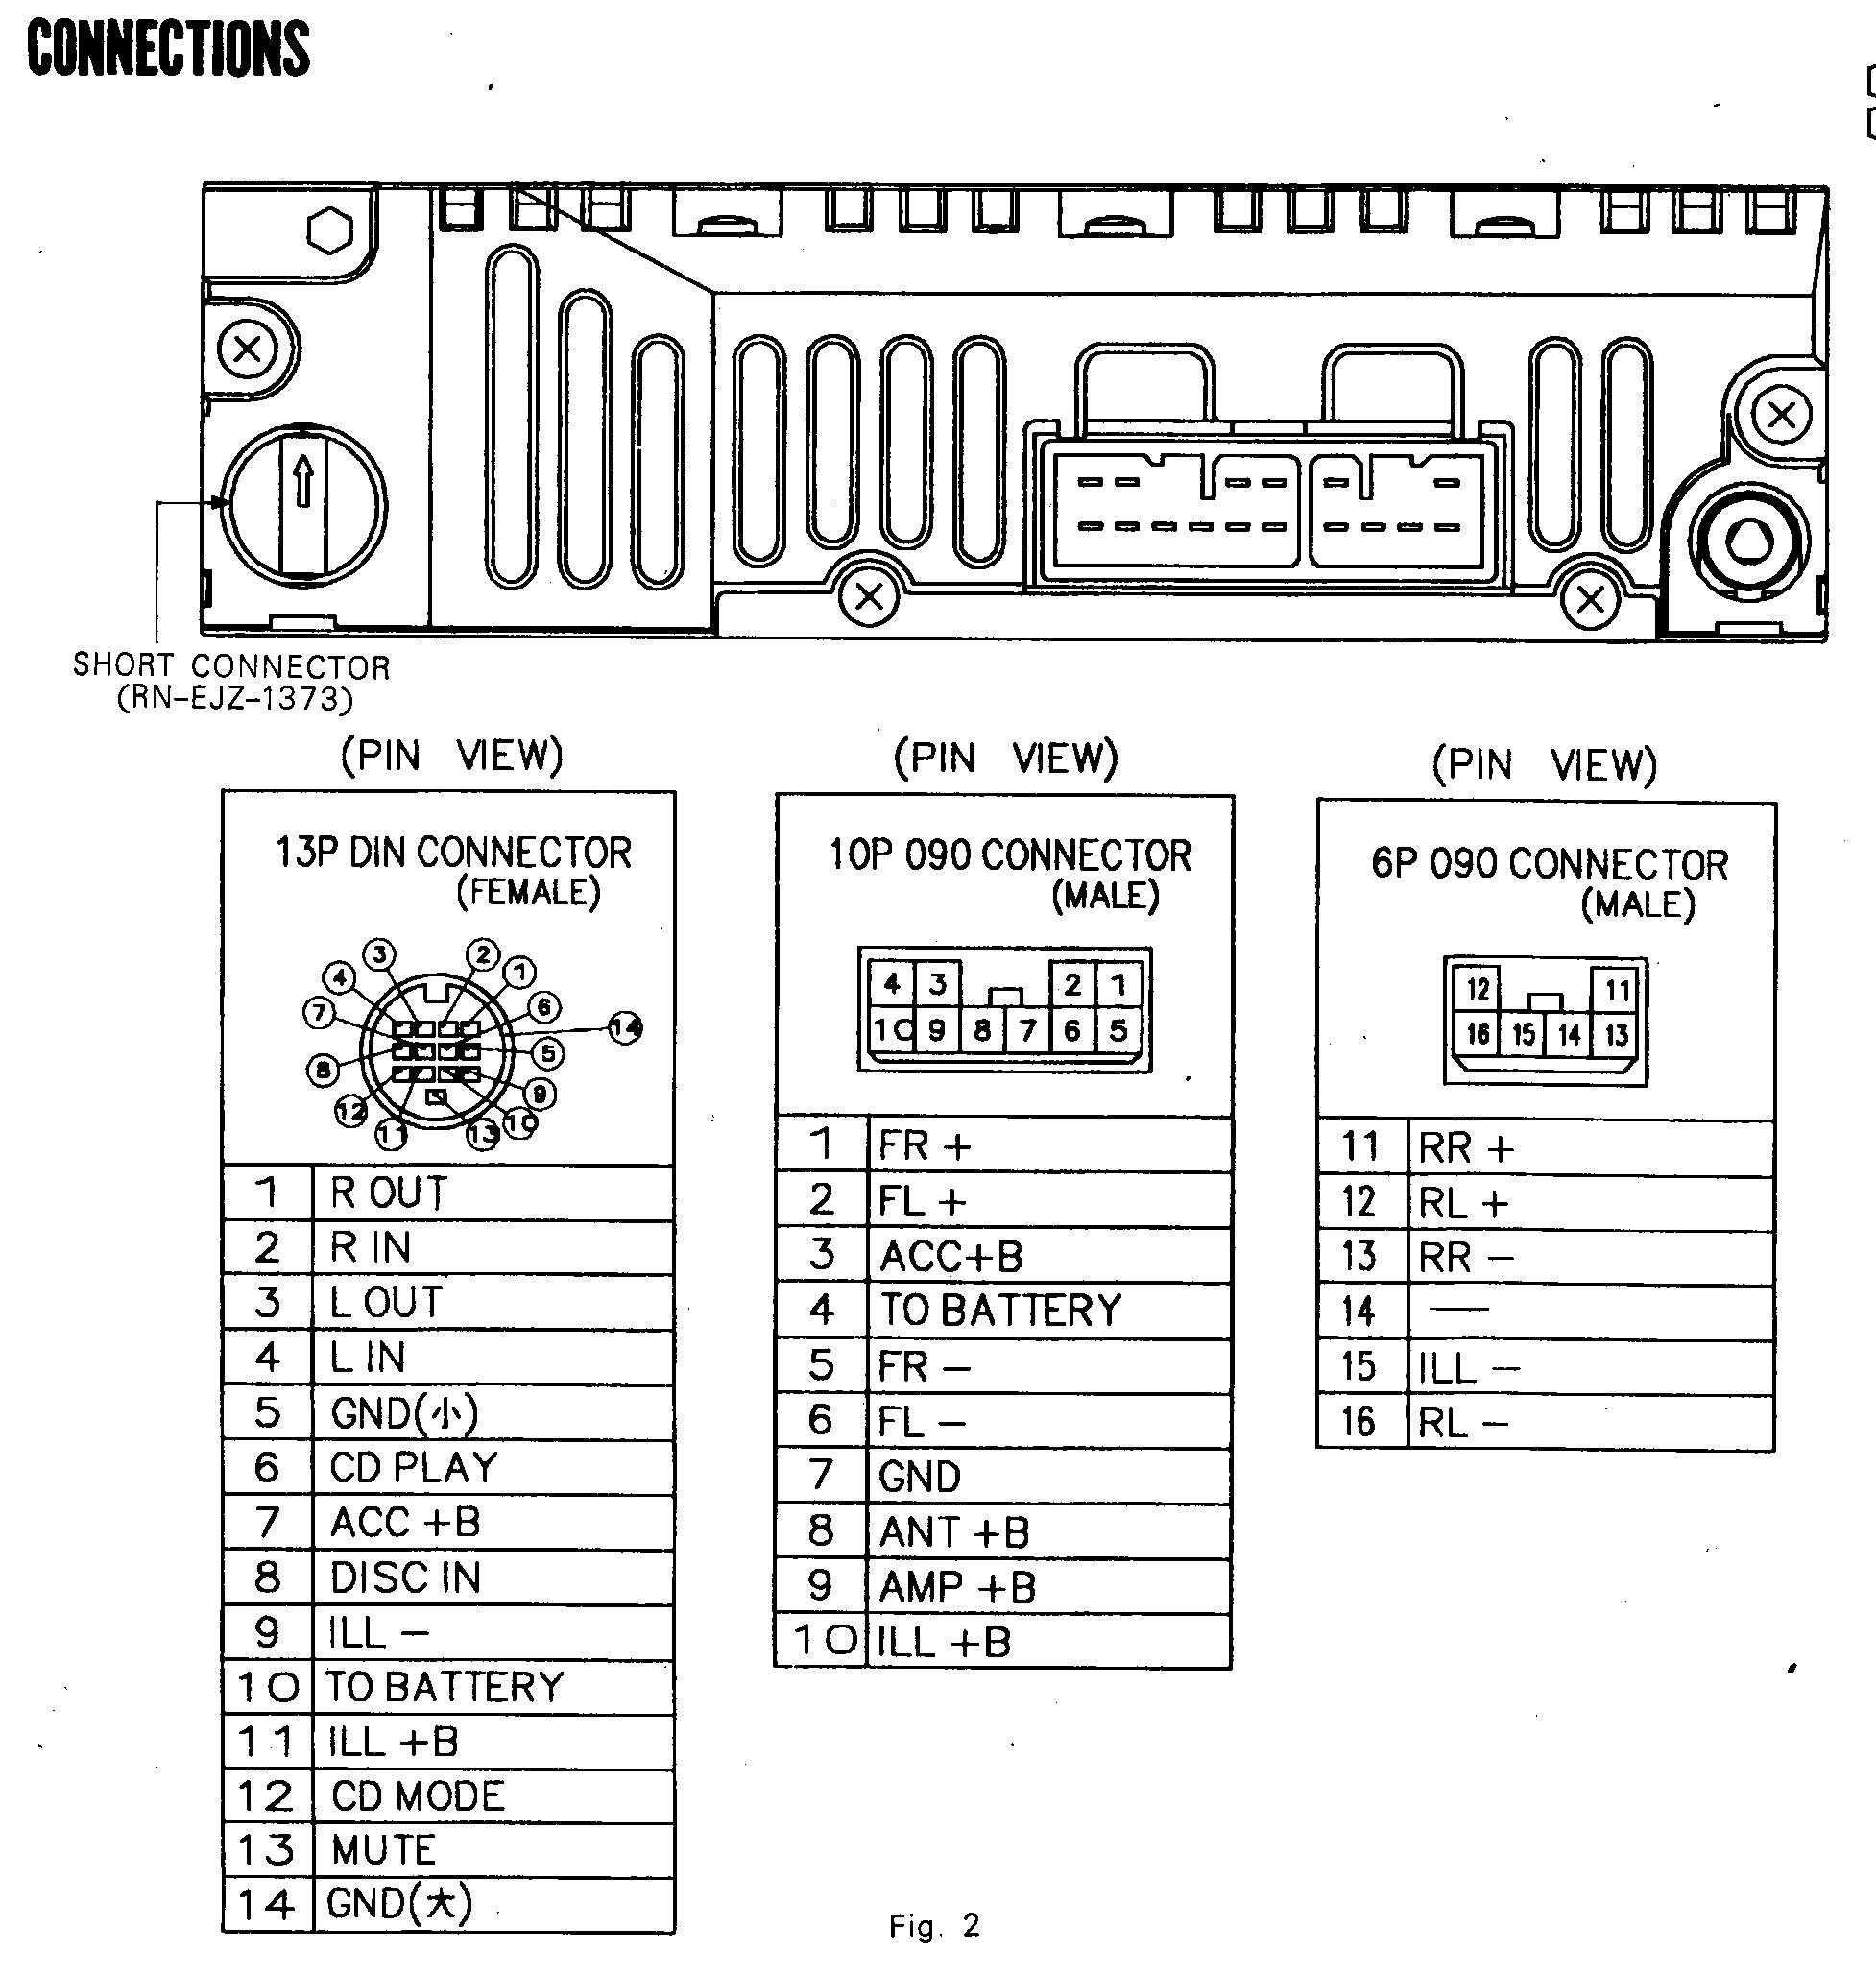 Fujitsu Ten 86120 Yza 82 New Pioneer Car Stereo Sony Car Stereo Car Stereo